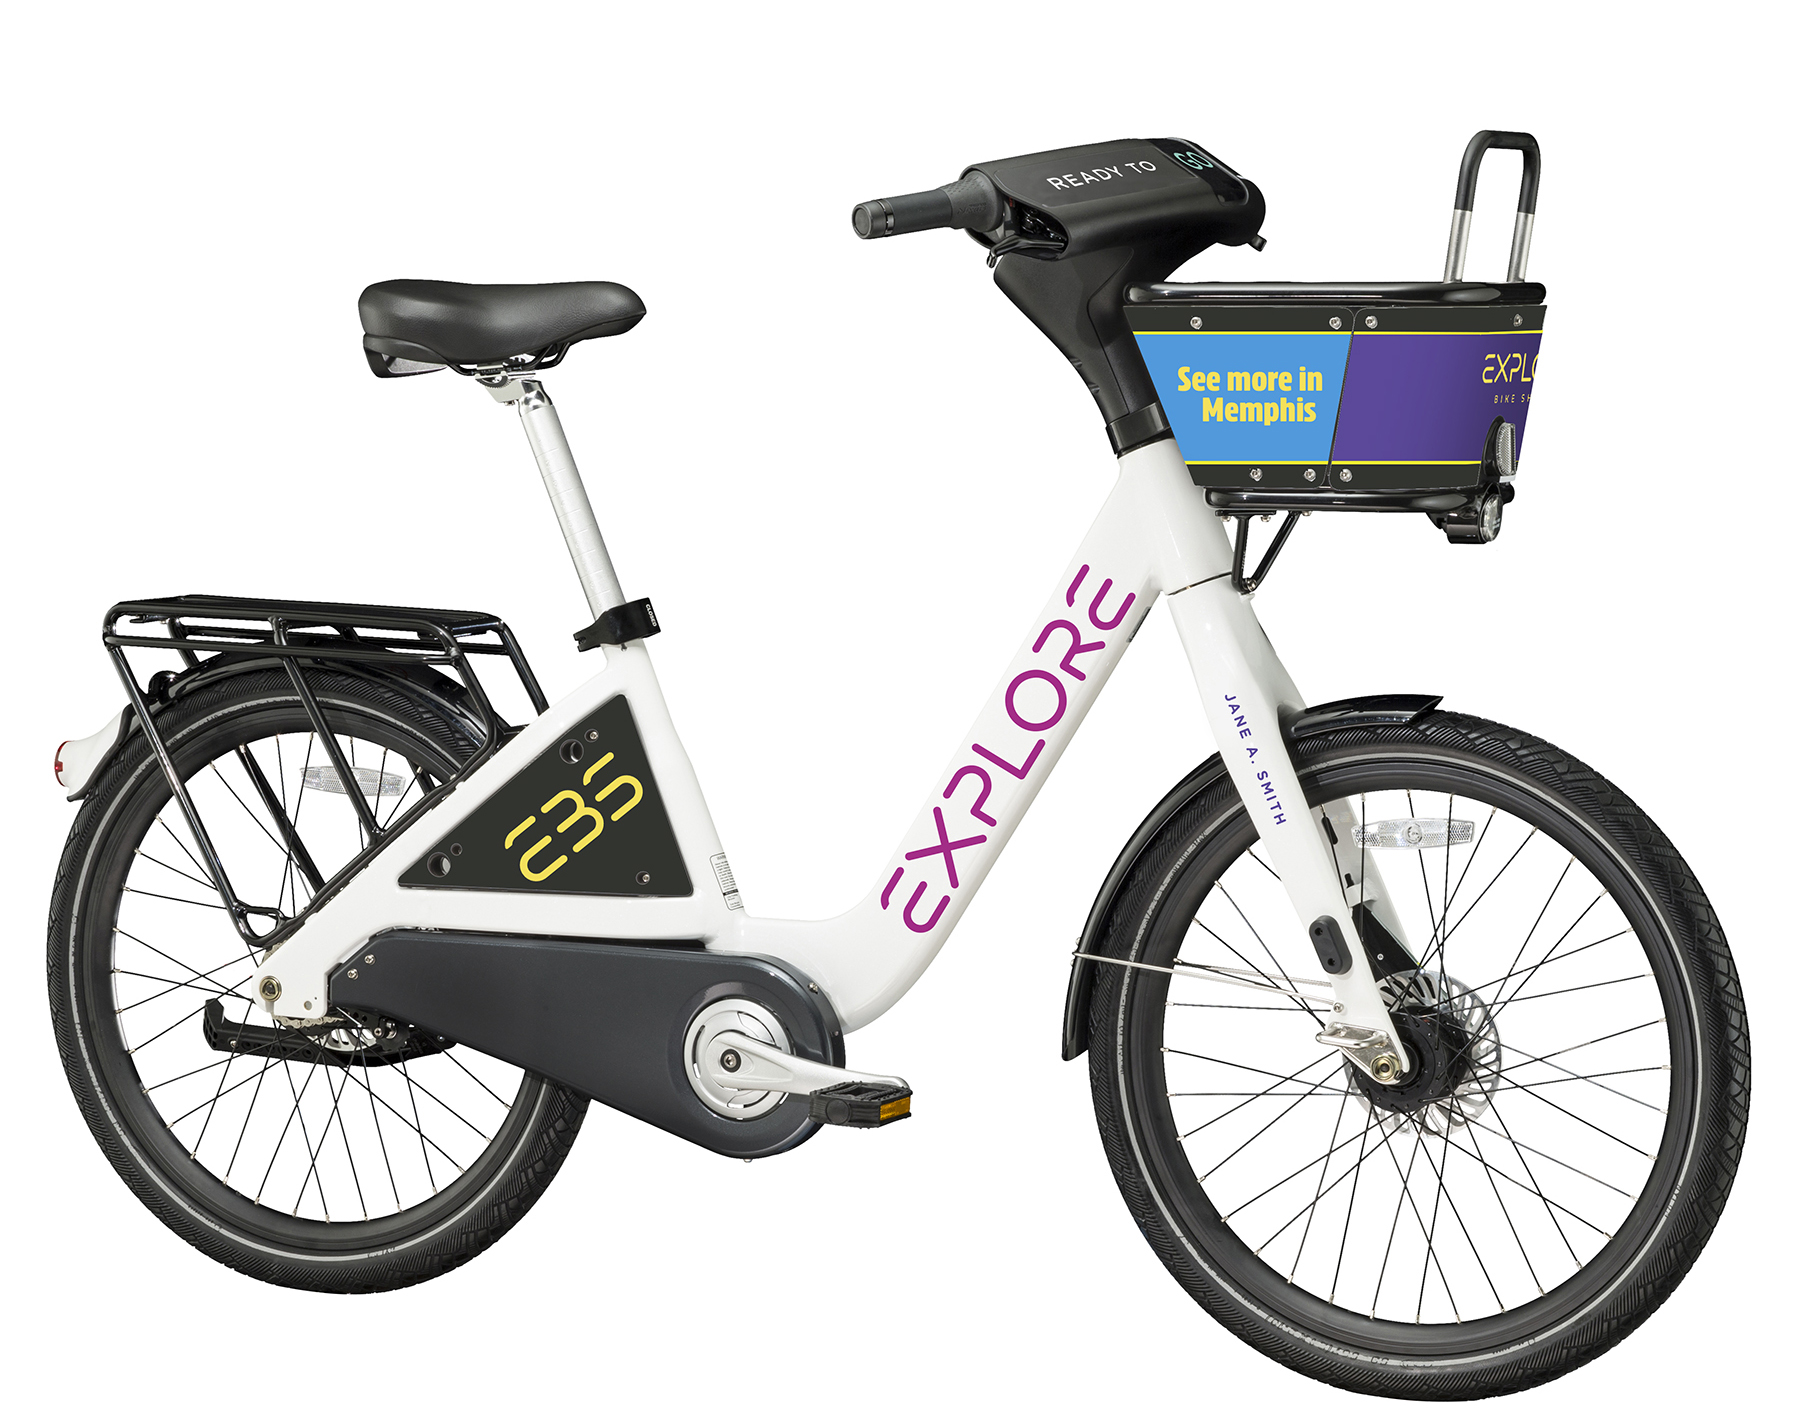 Dedicate a Bike